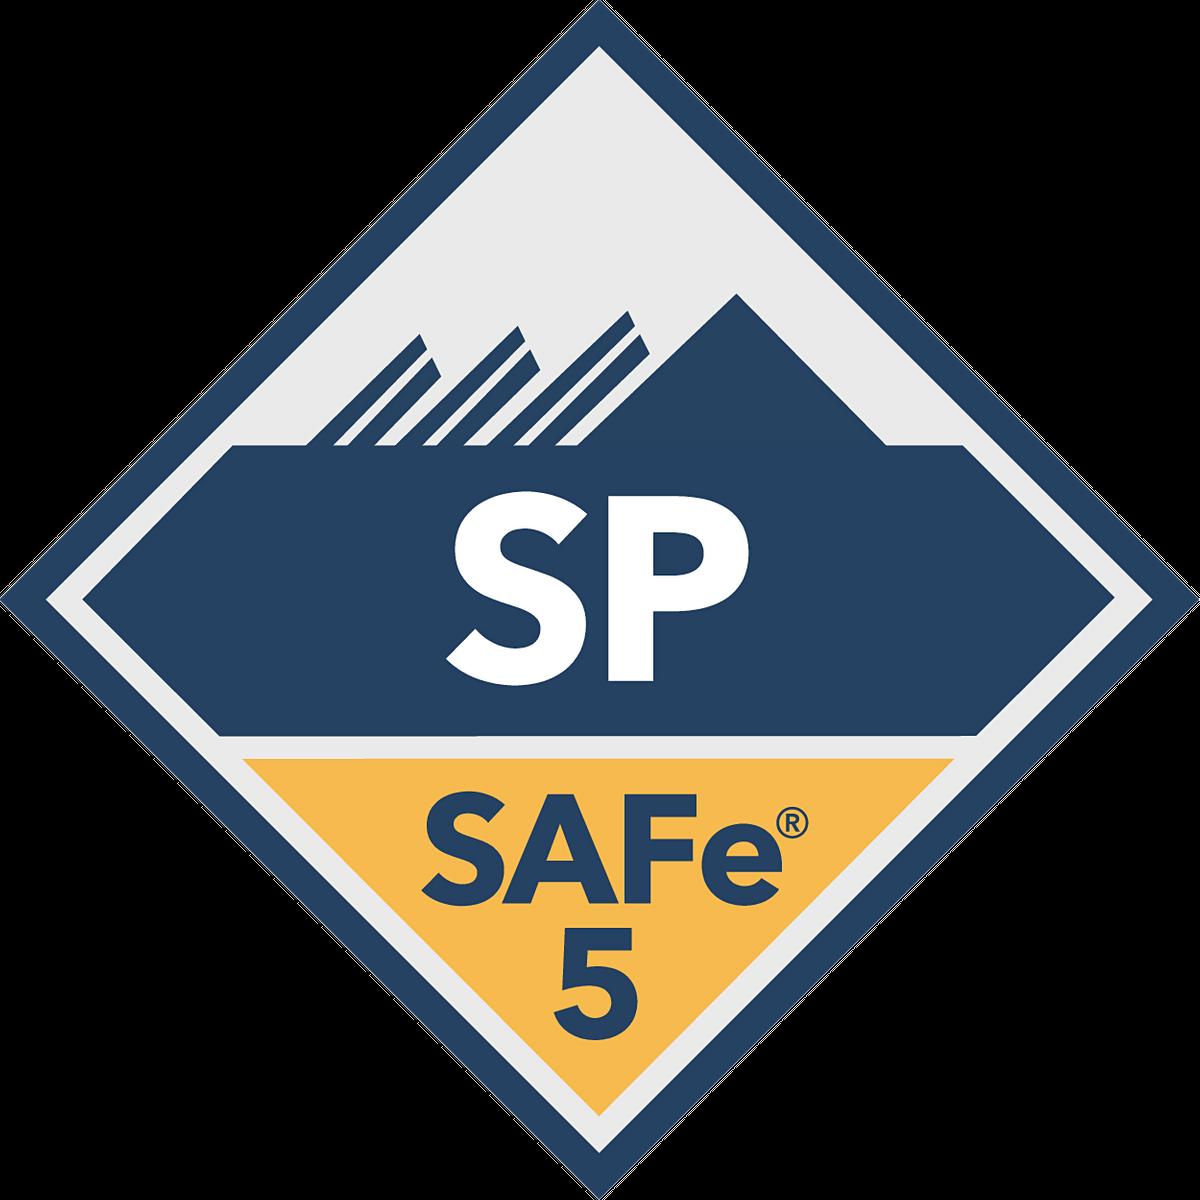 Online Scaled Agile : SAFe® for Teams with SAFe 5.0 Practitioner (SP) Certification Philadelphia, Pennsylvania